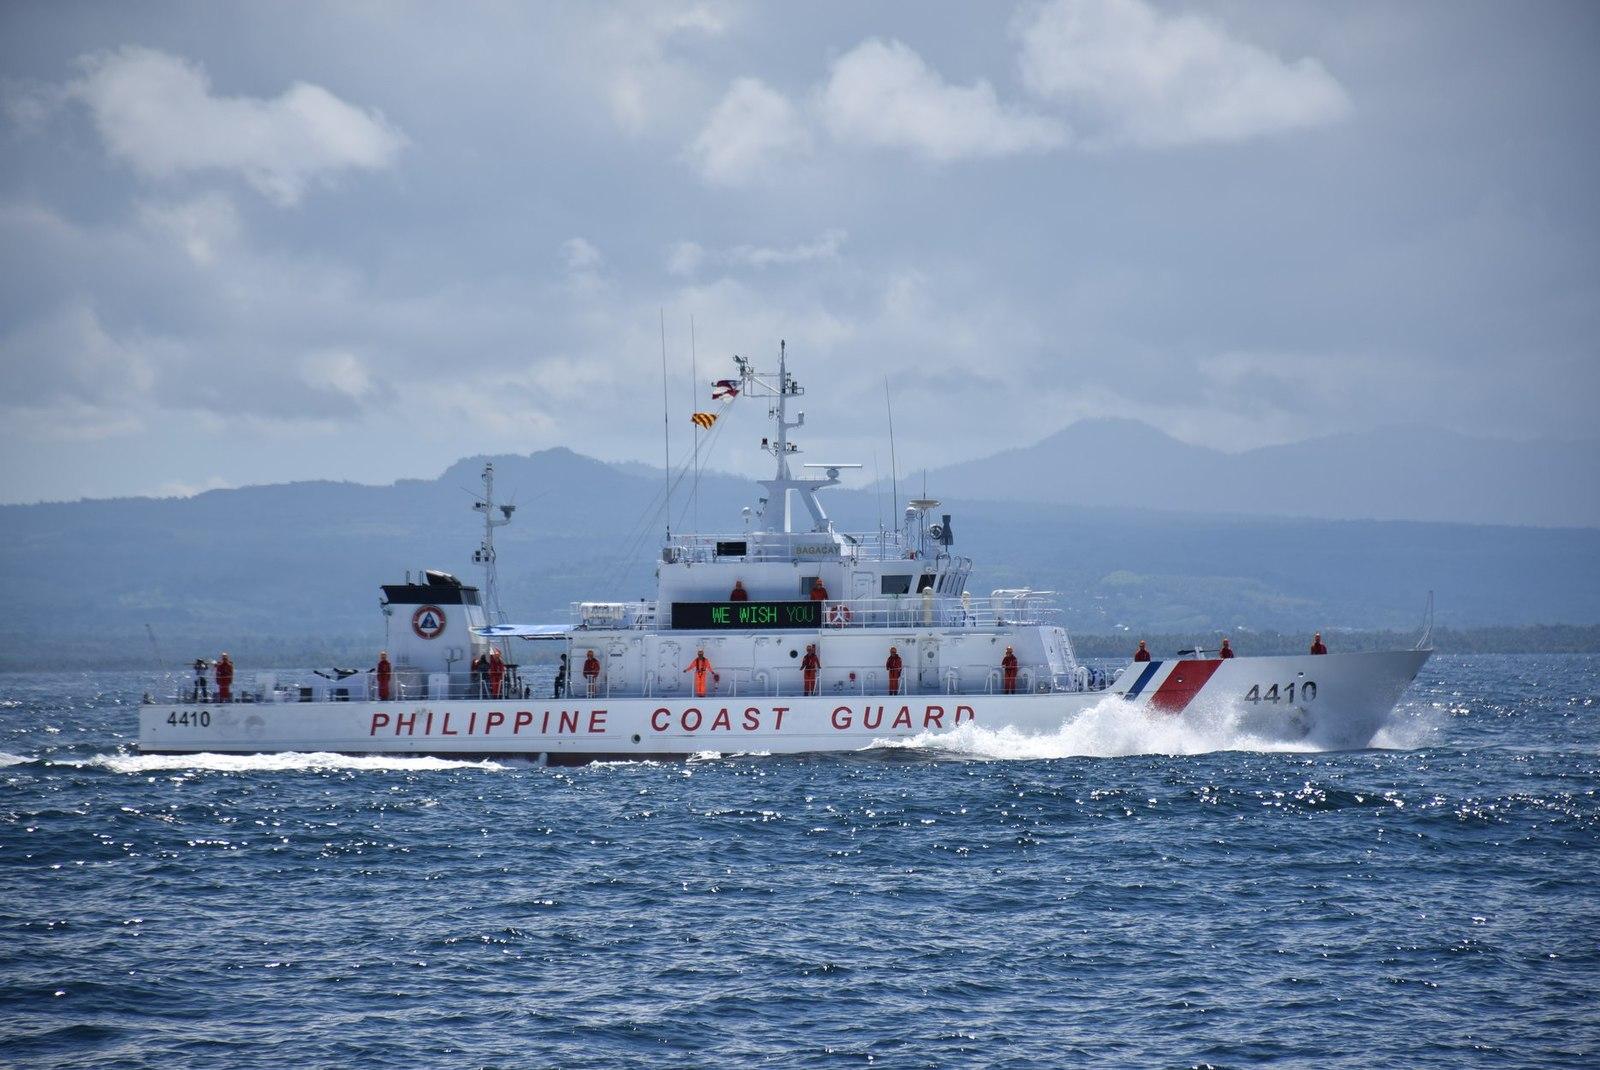 Philippine Coast Guard join Japan Coast Guard in a communication exercise involving BRP Cape San Agustin, BRP Bagacay and patrol ship Echigo at Basilan Strait, November 21, 2018. Photo courtesy of Philippine Coast Guard.